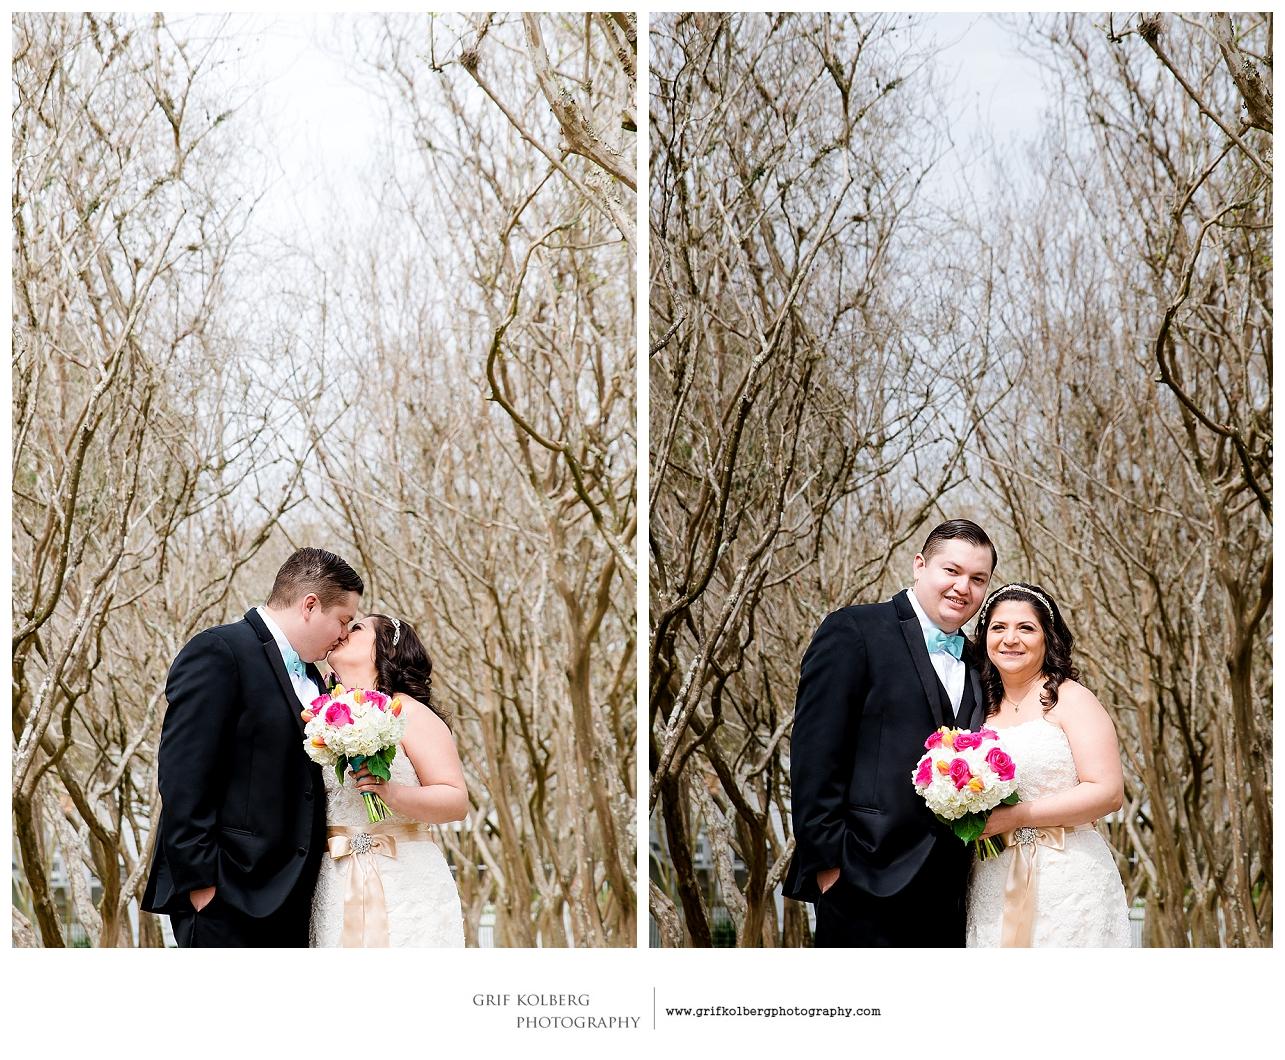 Wedding Photographer, George Ranch Historical Park, Wedding Portrait